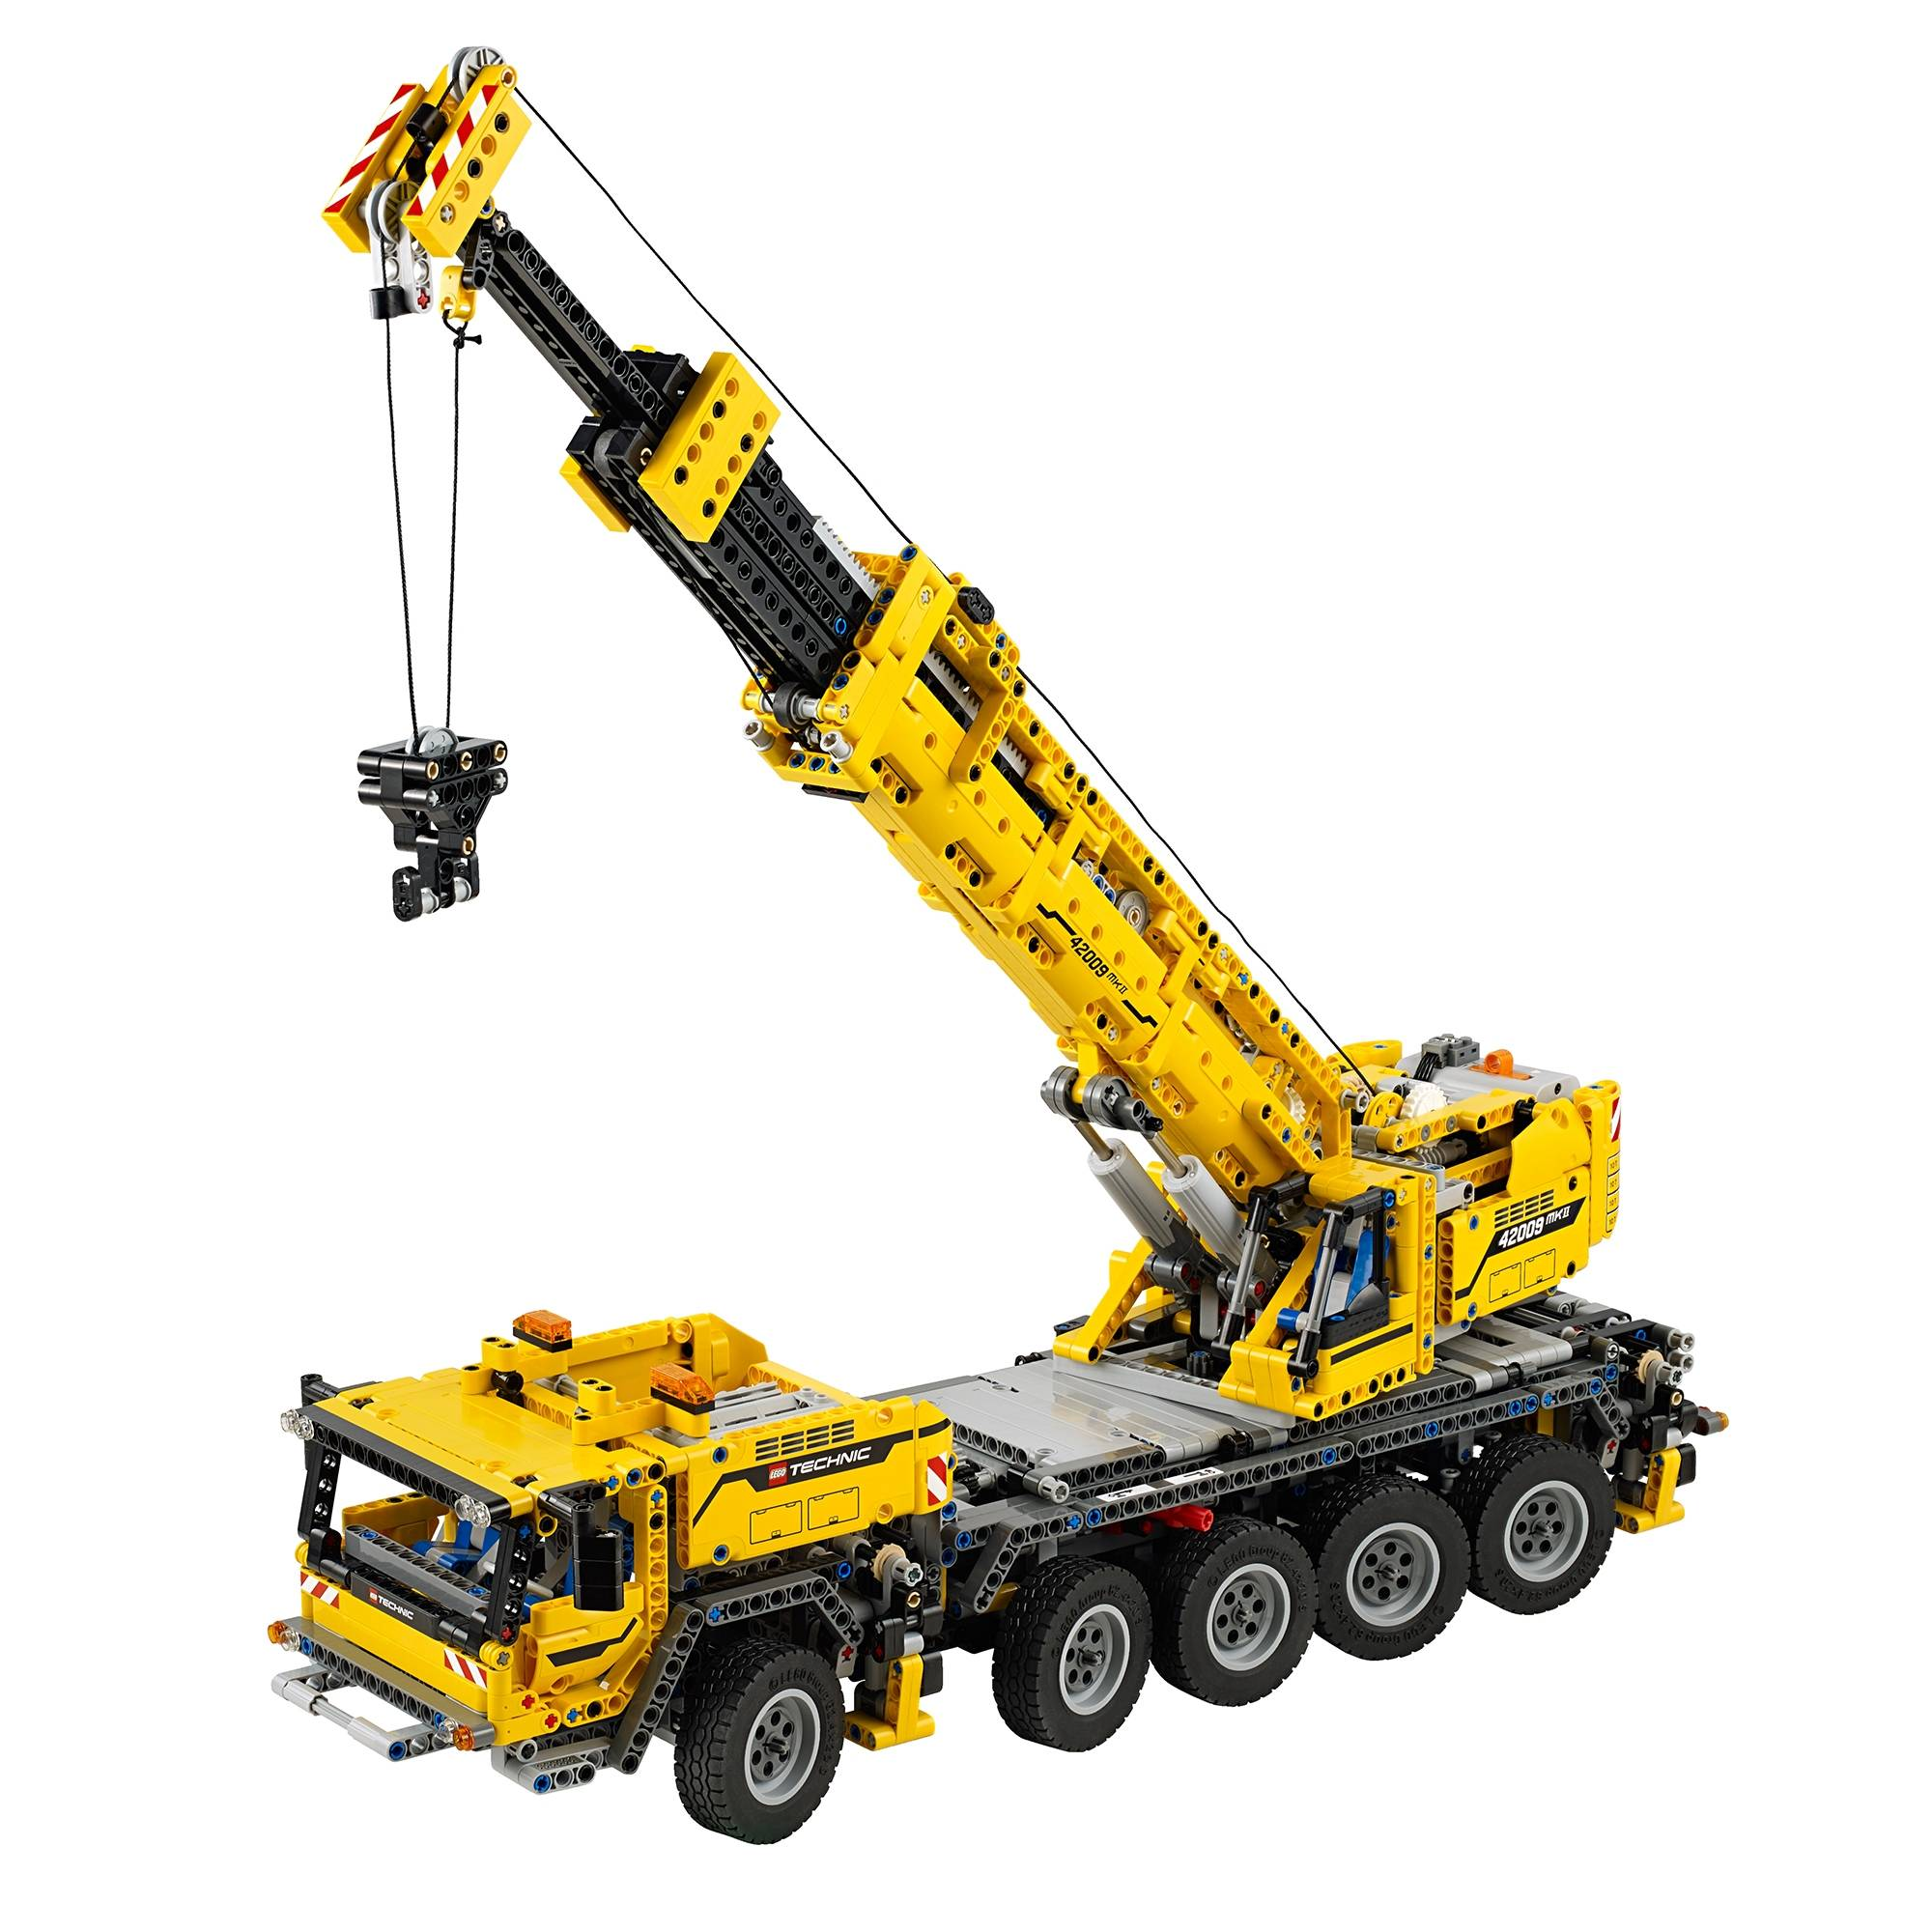 LEGO 42009 MOBILE CRANE MK II